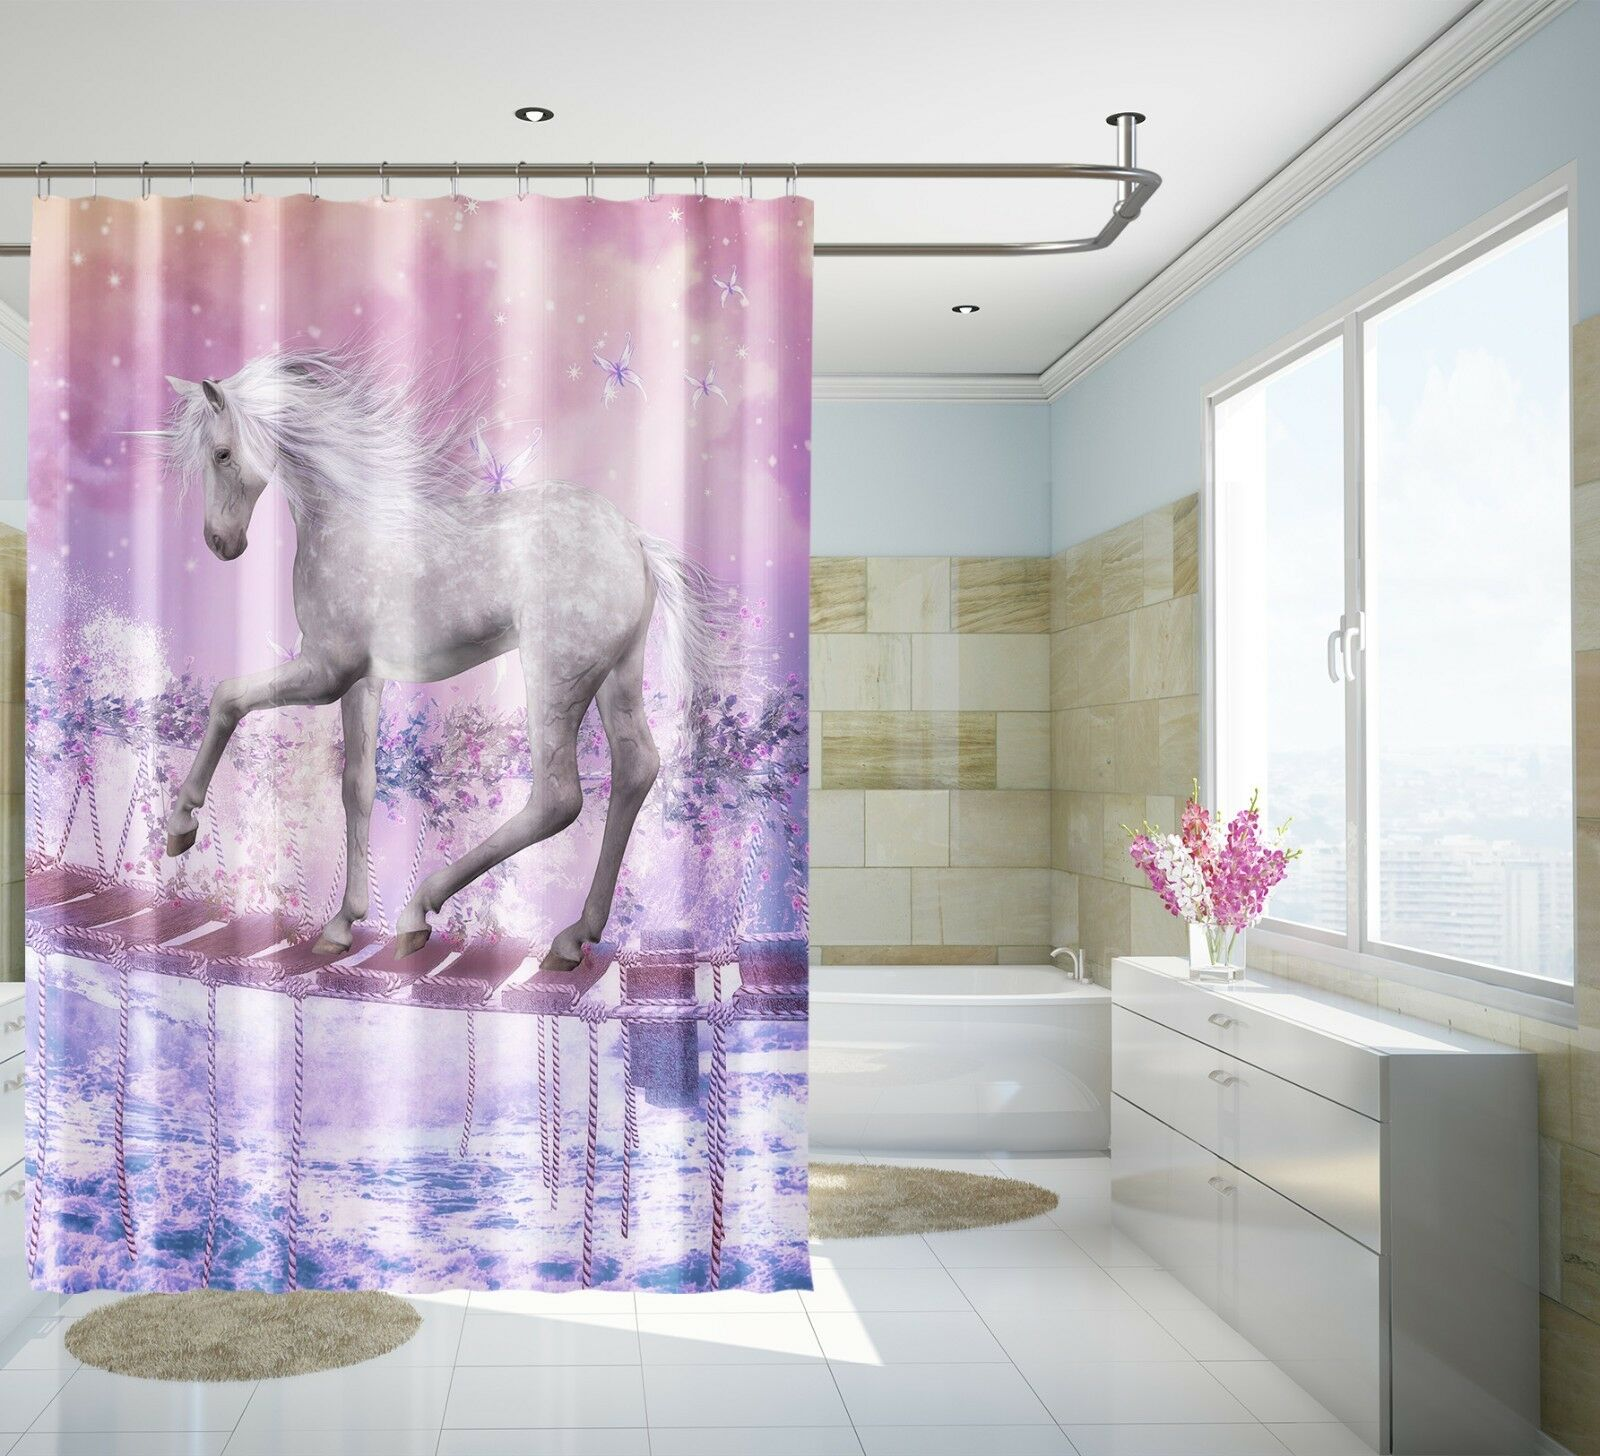 3D Einhorn Tier 21 Duschvorhang Duschvorhang Duschvorhang Wasserdicht Faser Bad Daheim Windows Toilette DE | Schön In Der Farbe  fdc9e6